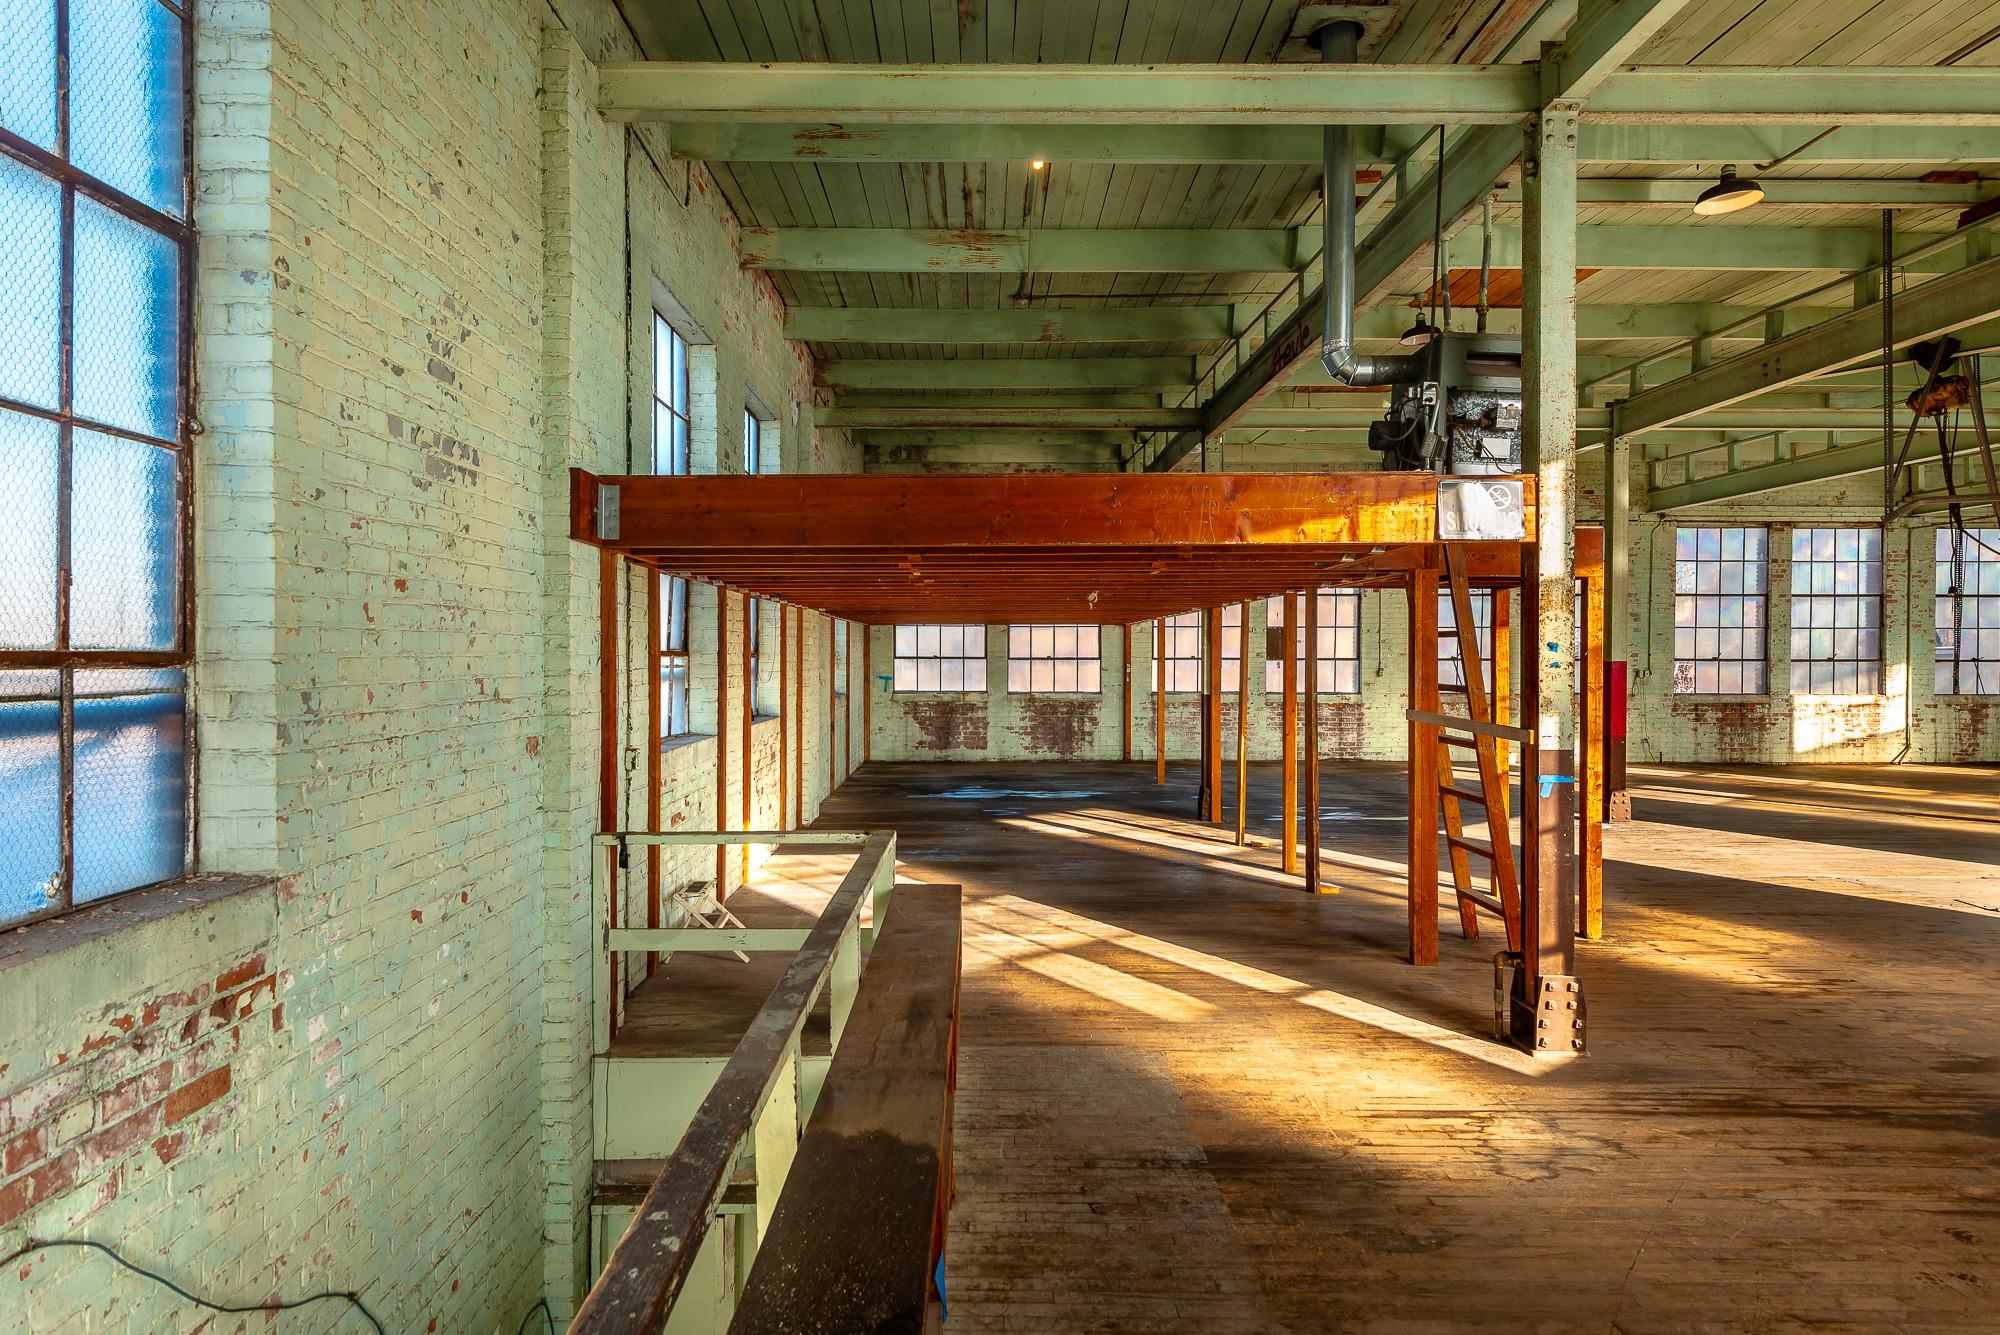 prince_concepts_powerplant_interior_renovation-1.jpg